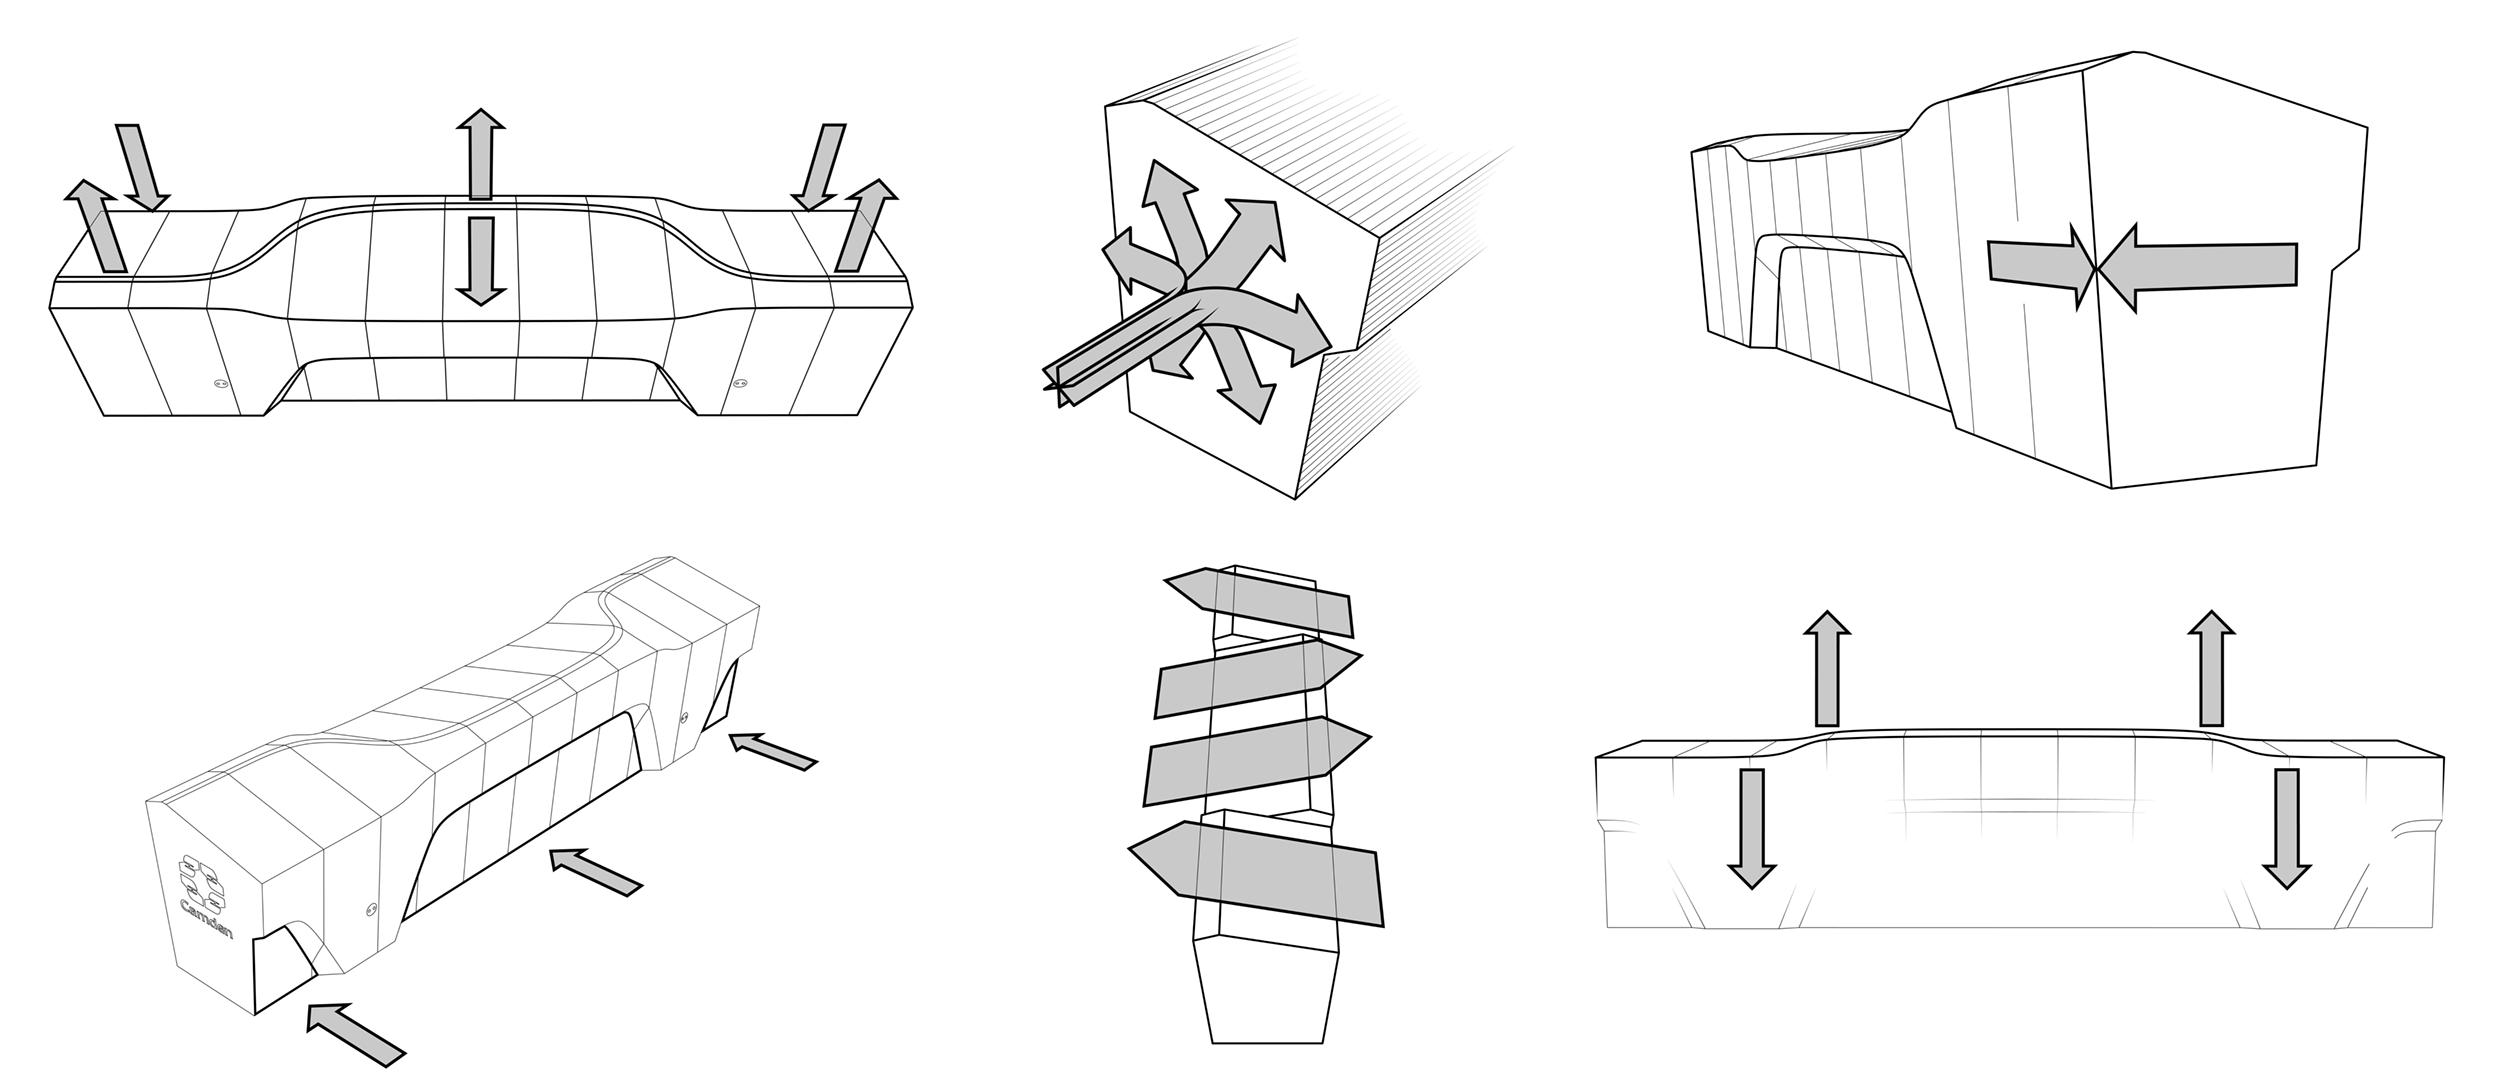 tvarijonas-camden-bench-london-diagrams.png